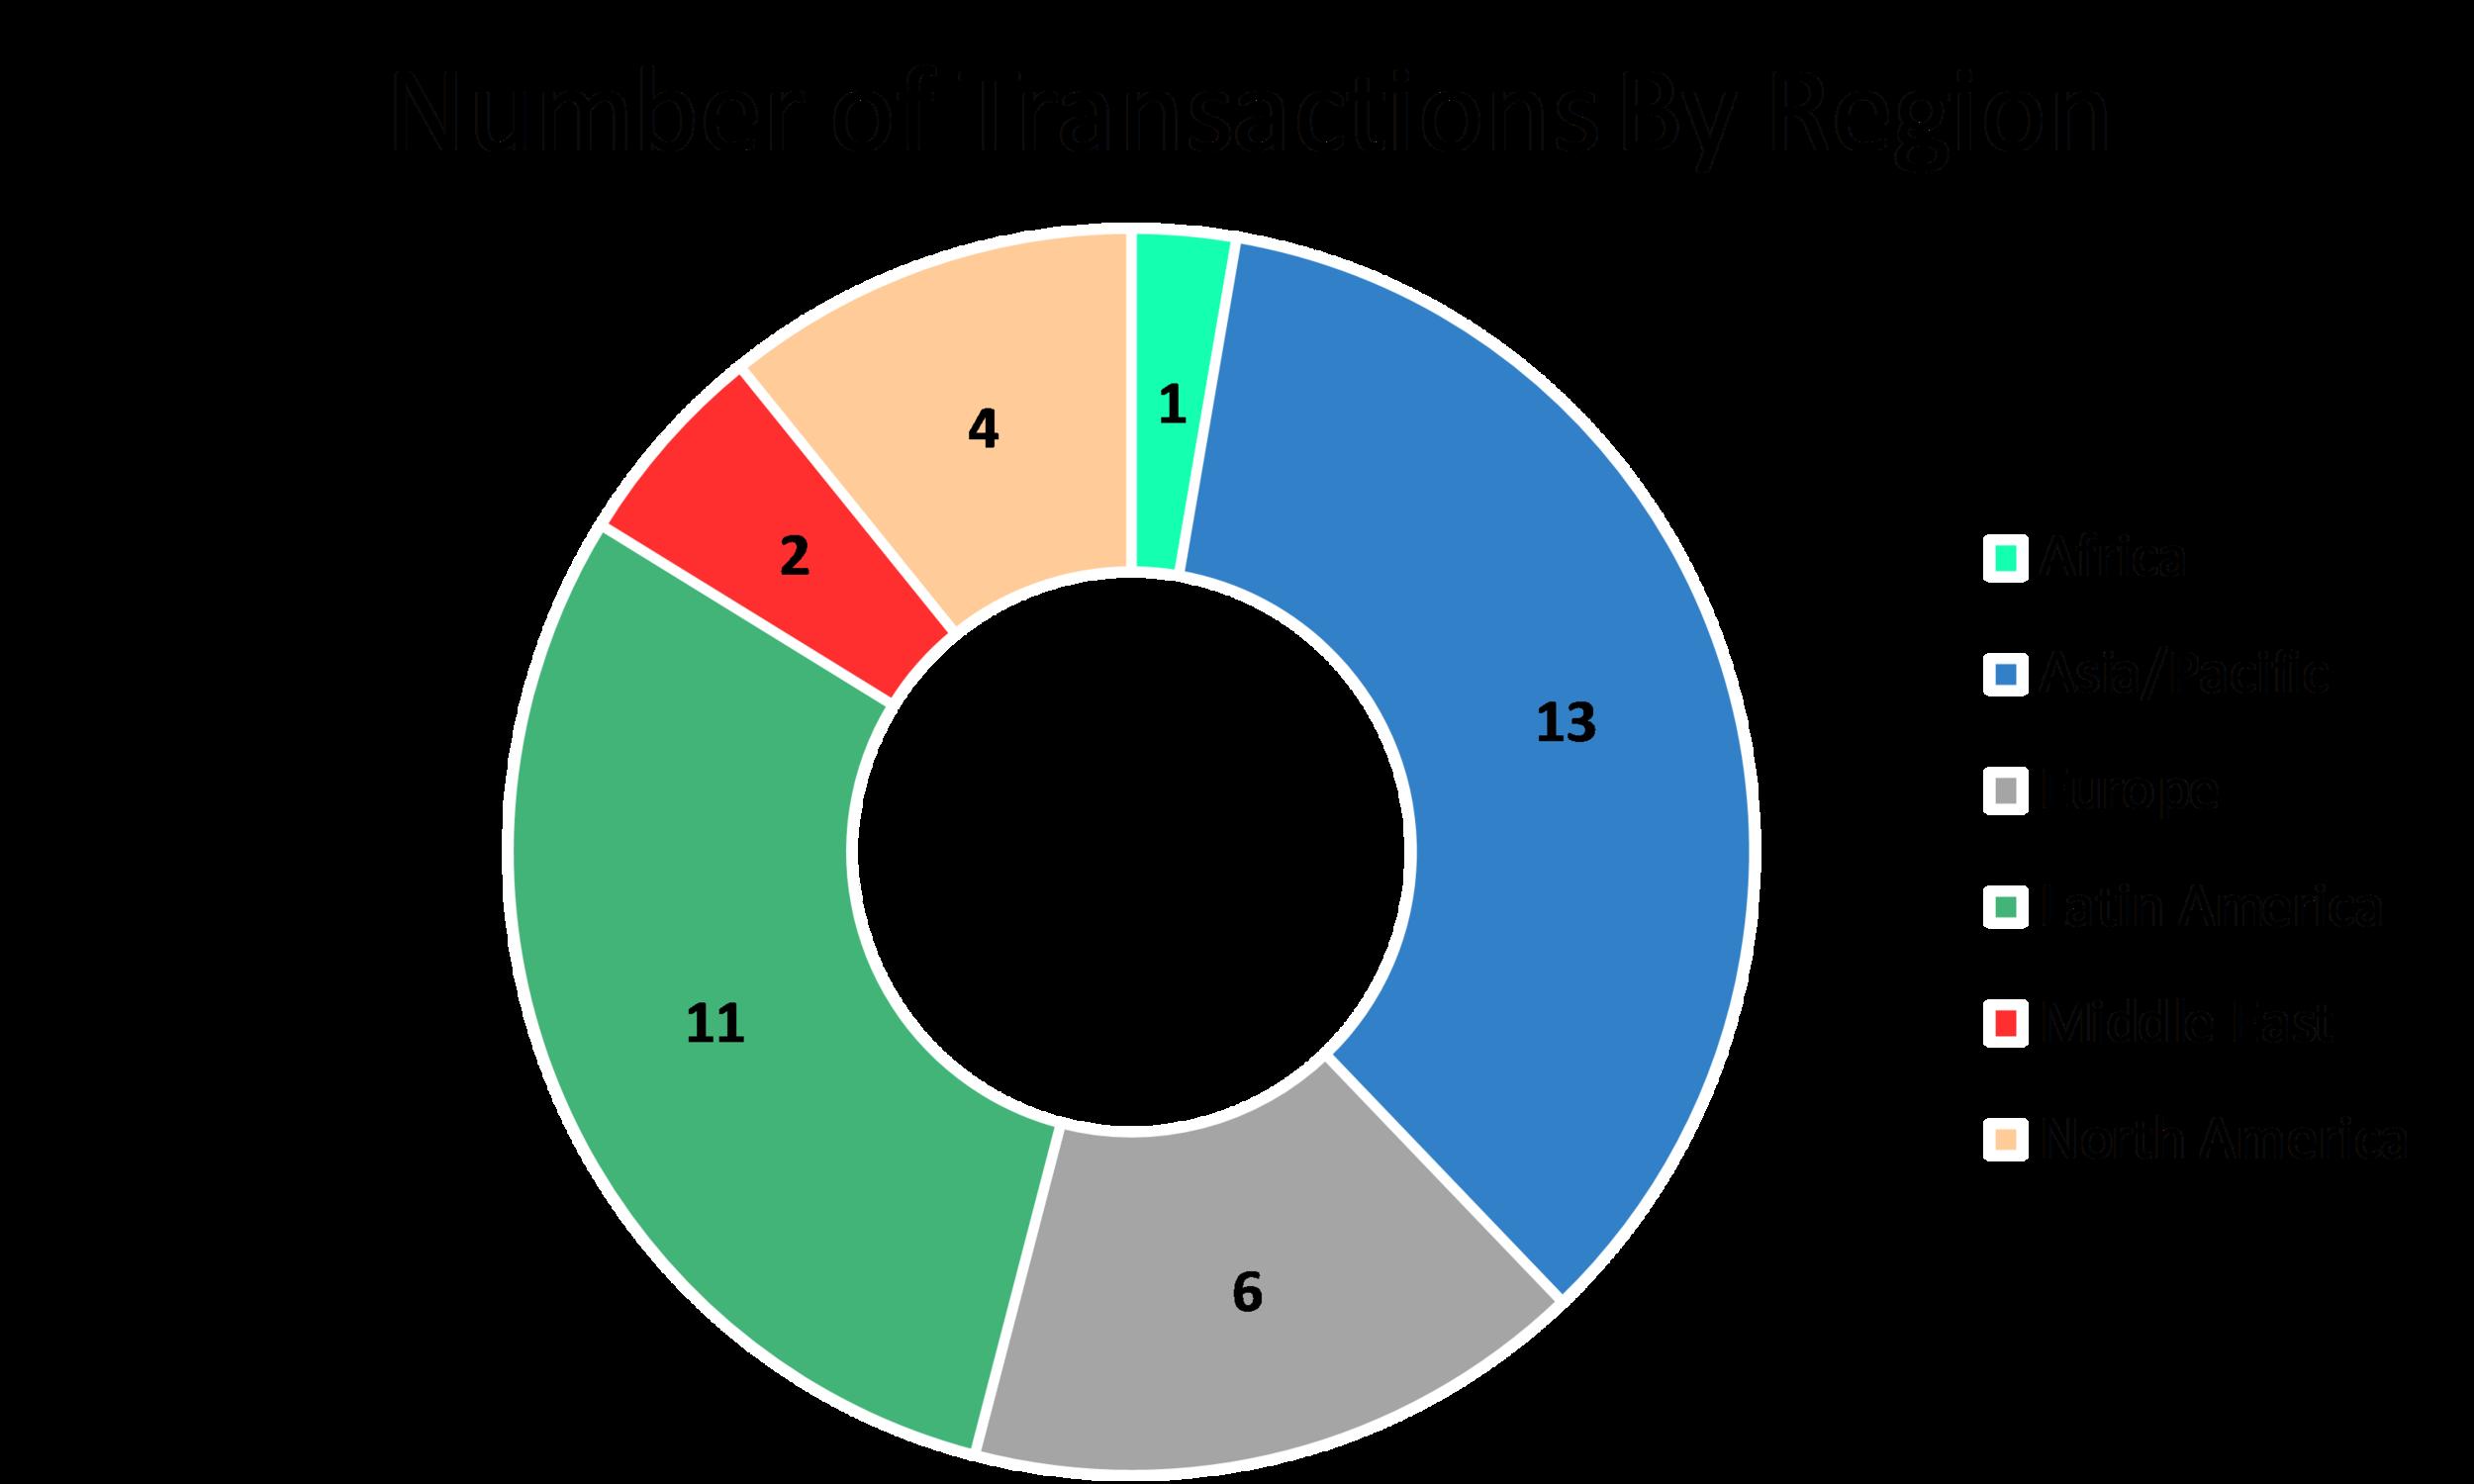 Total Number of Alternative Energy Deals: 37